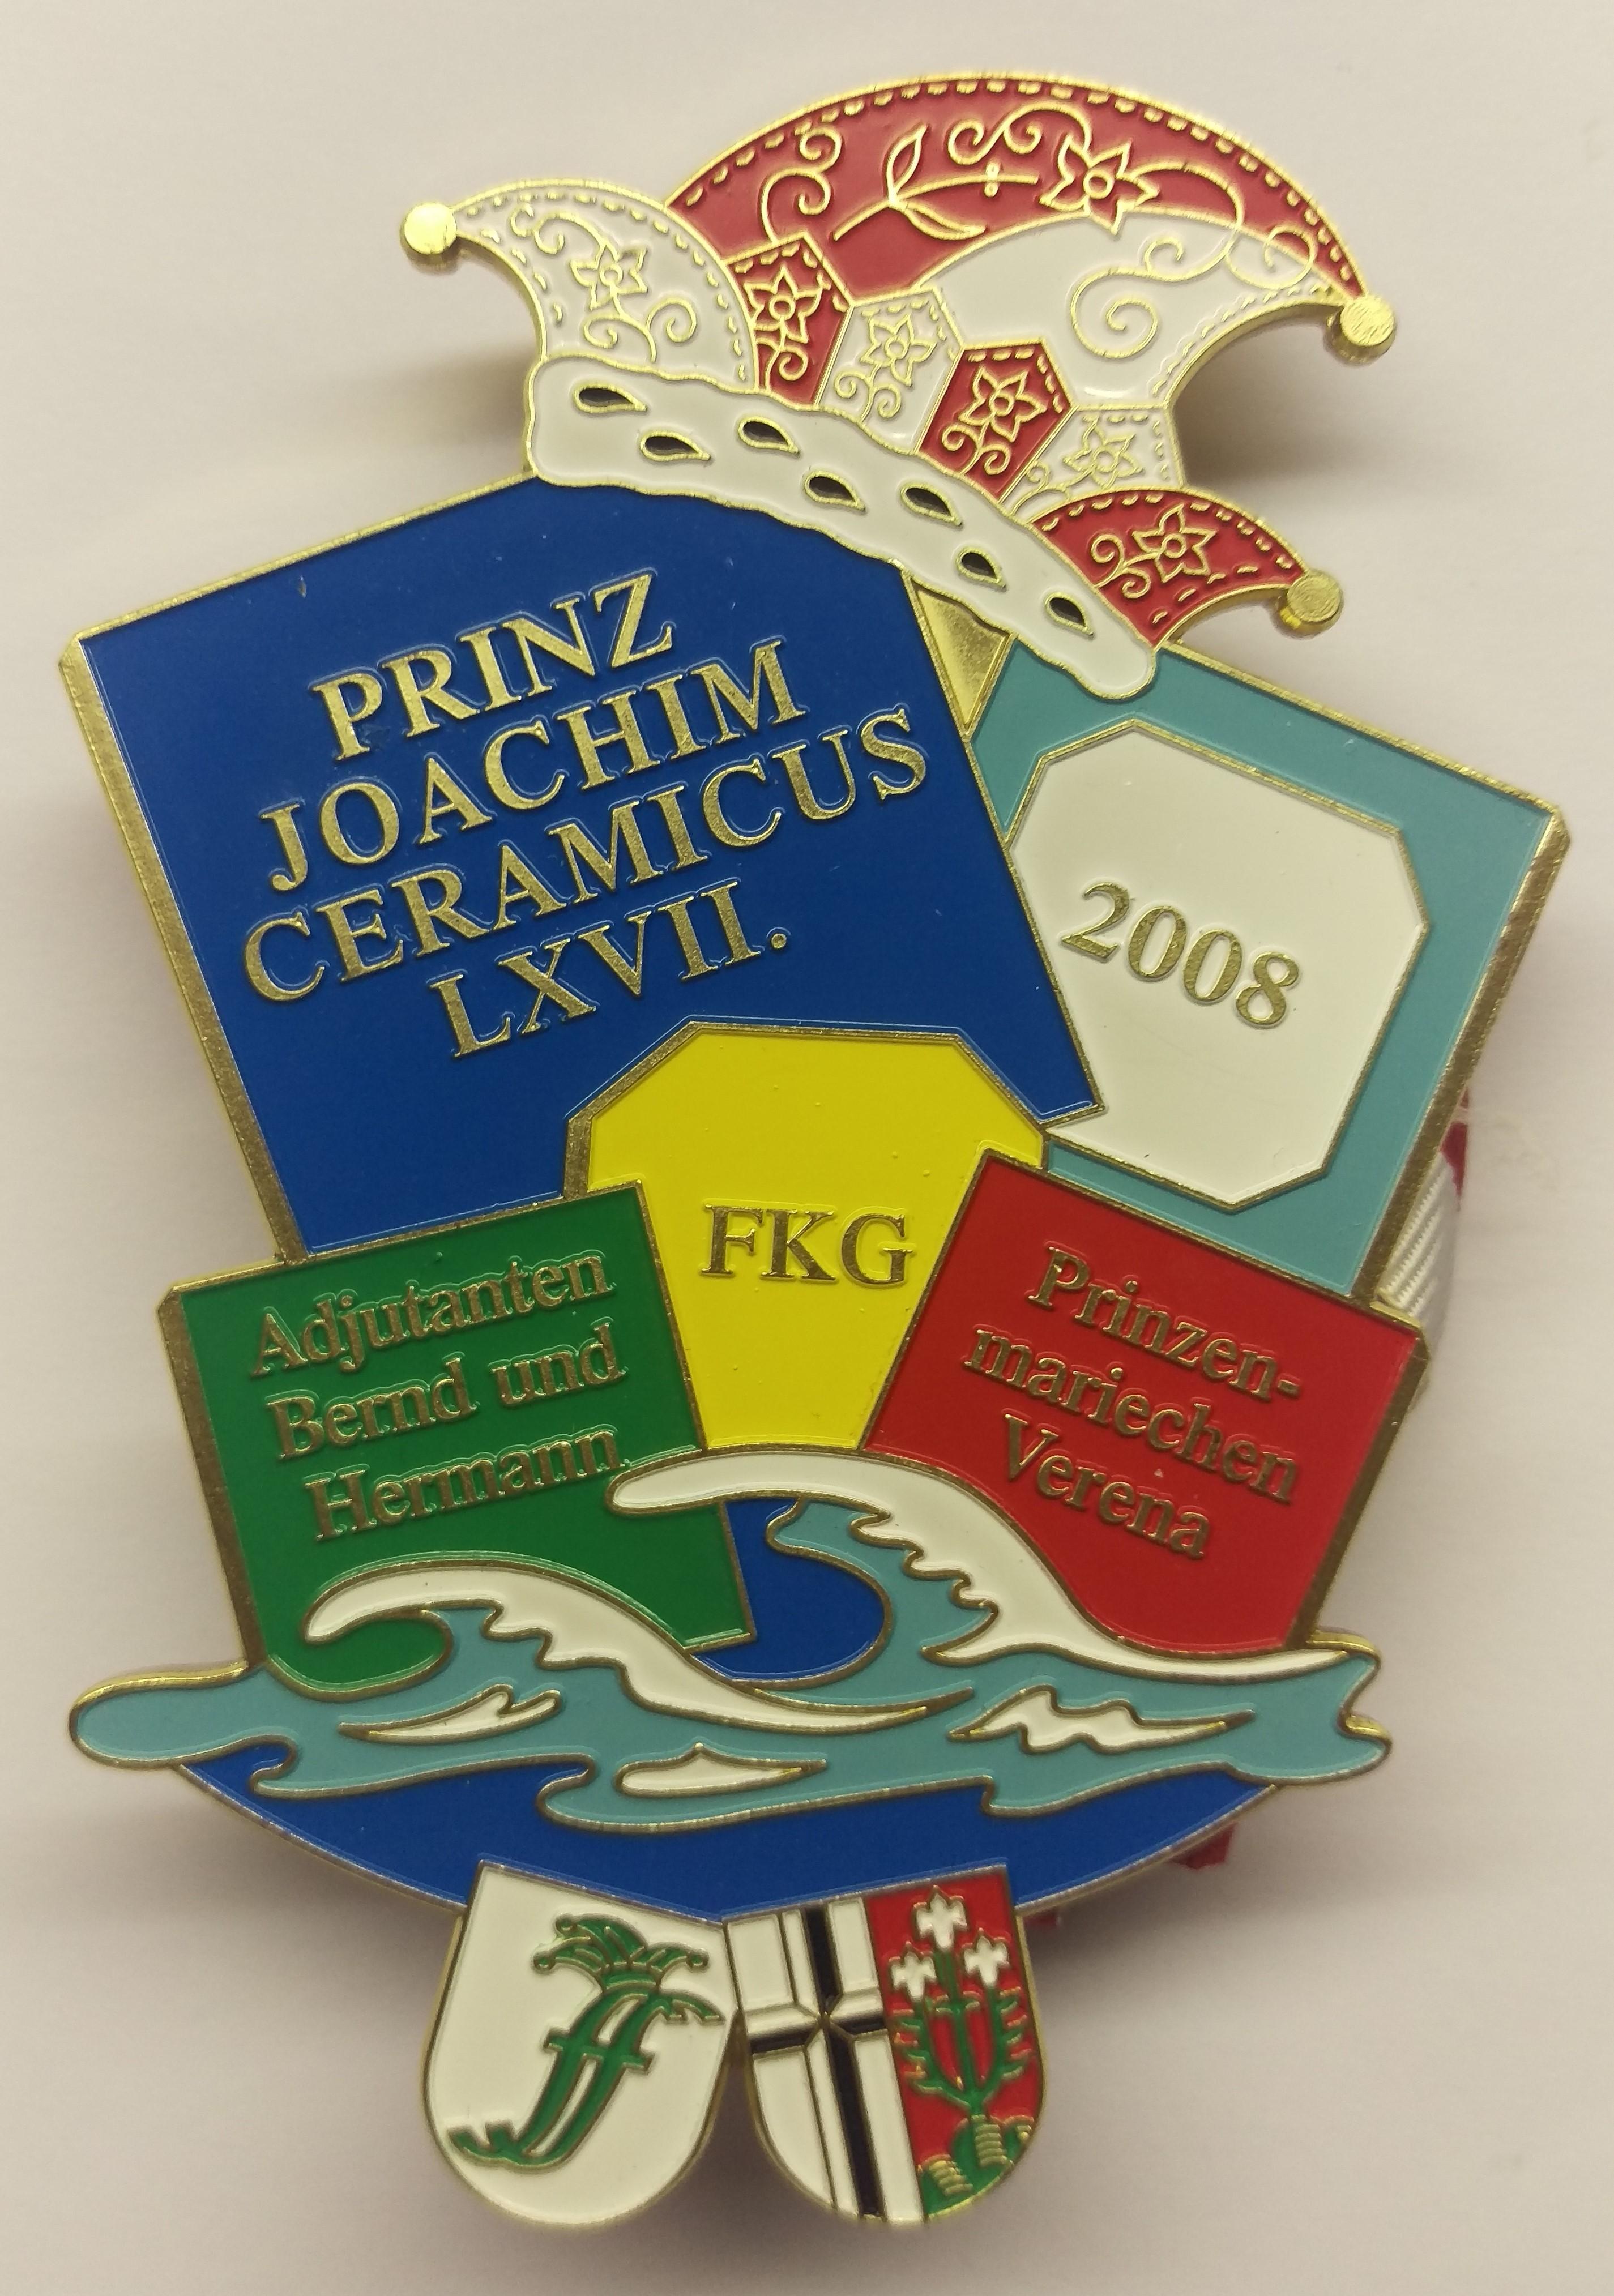 fkg-prinzenorden-2008